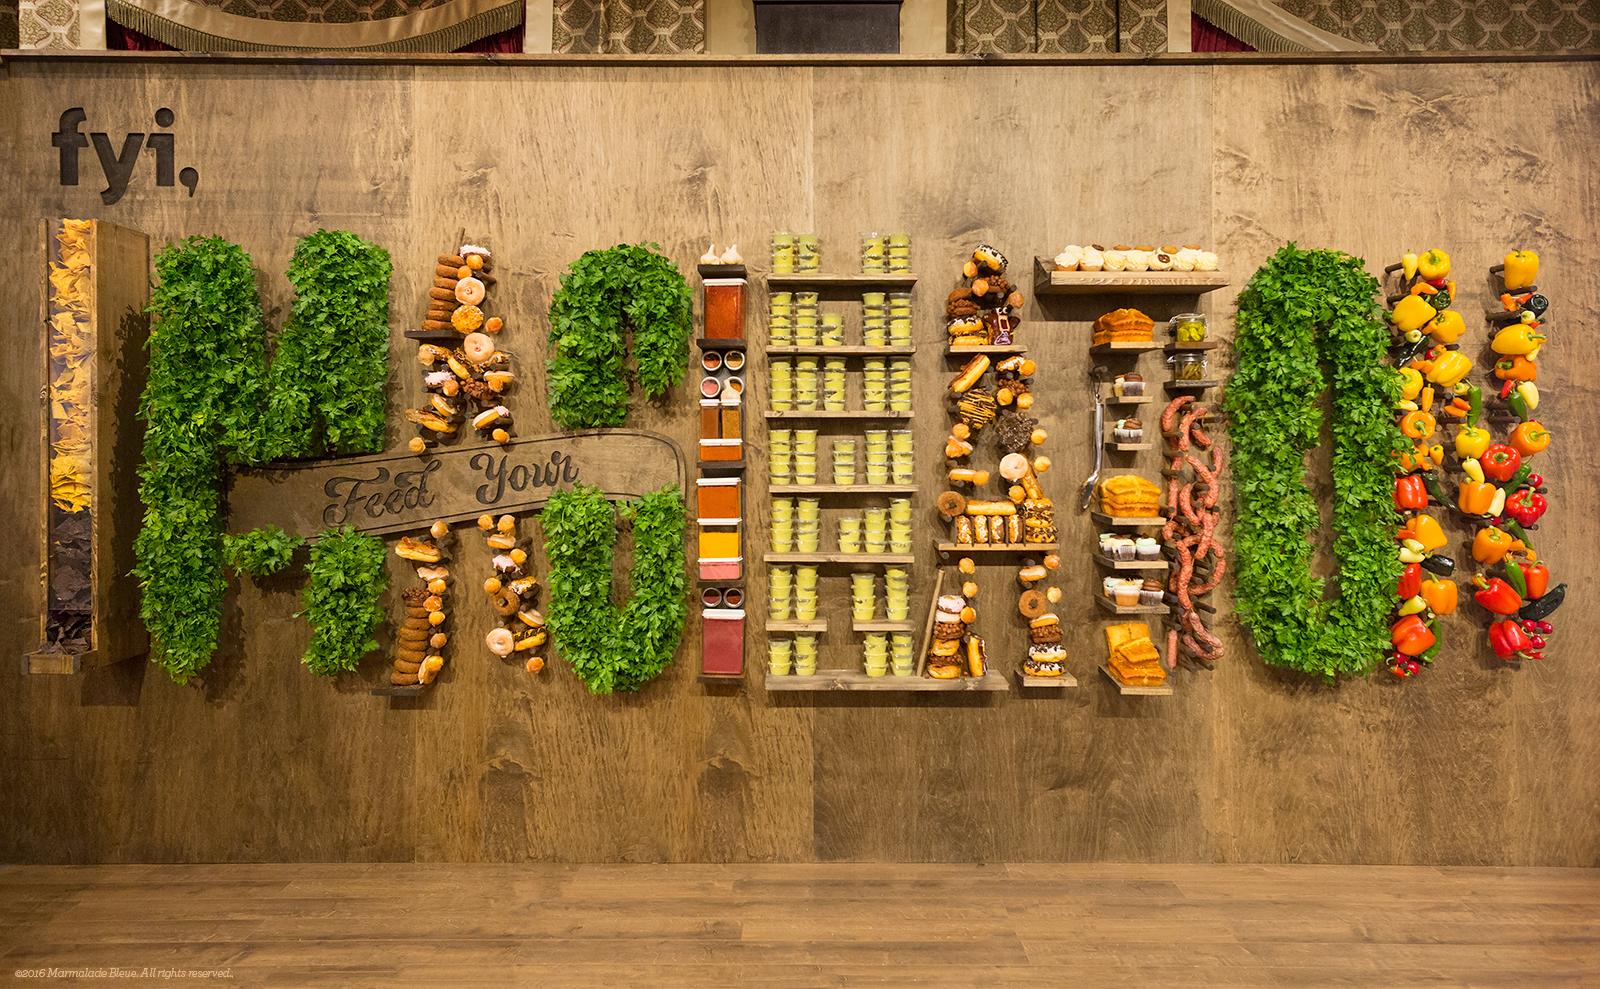 Food Typography + FYI for SXSW